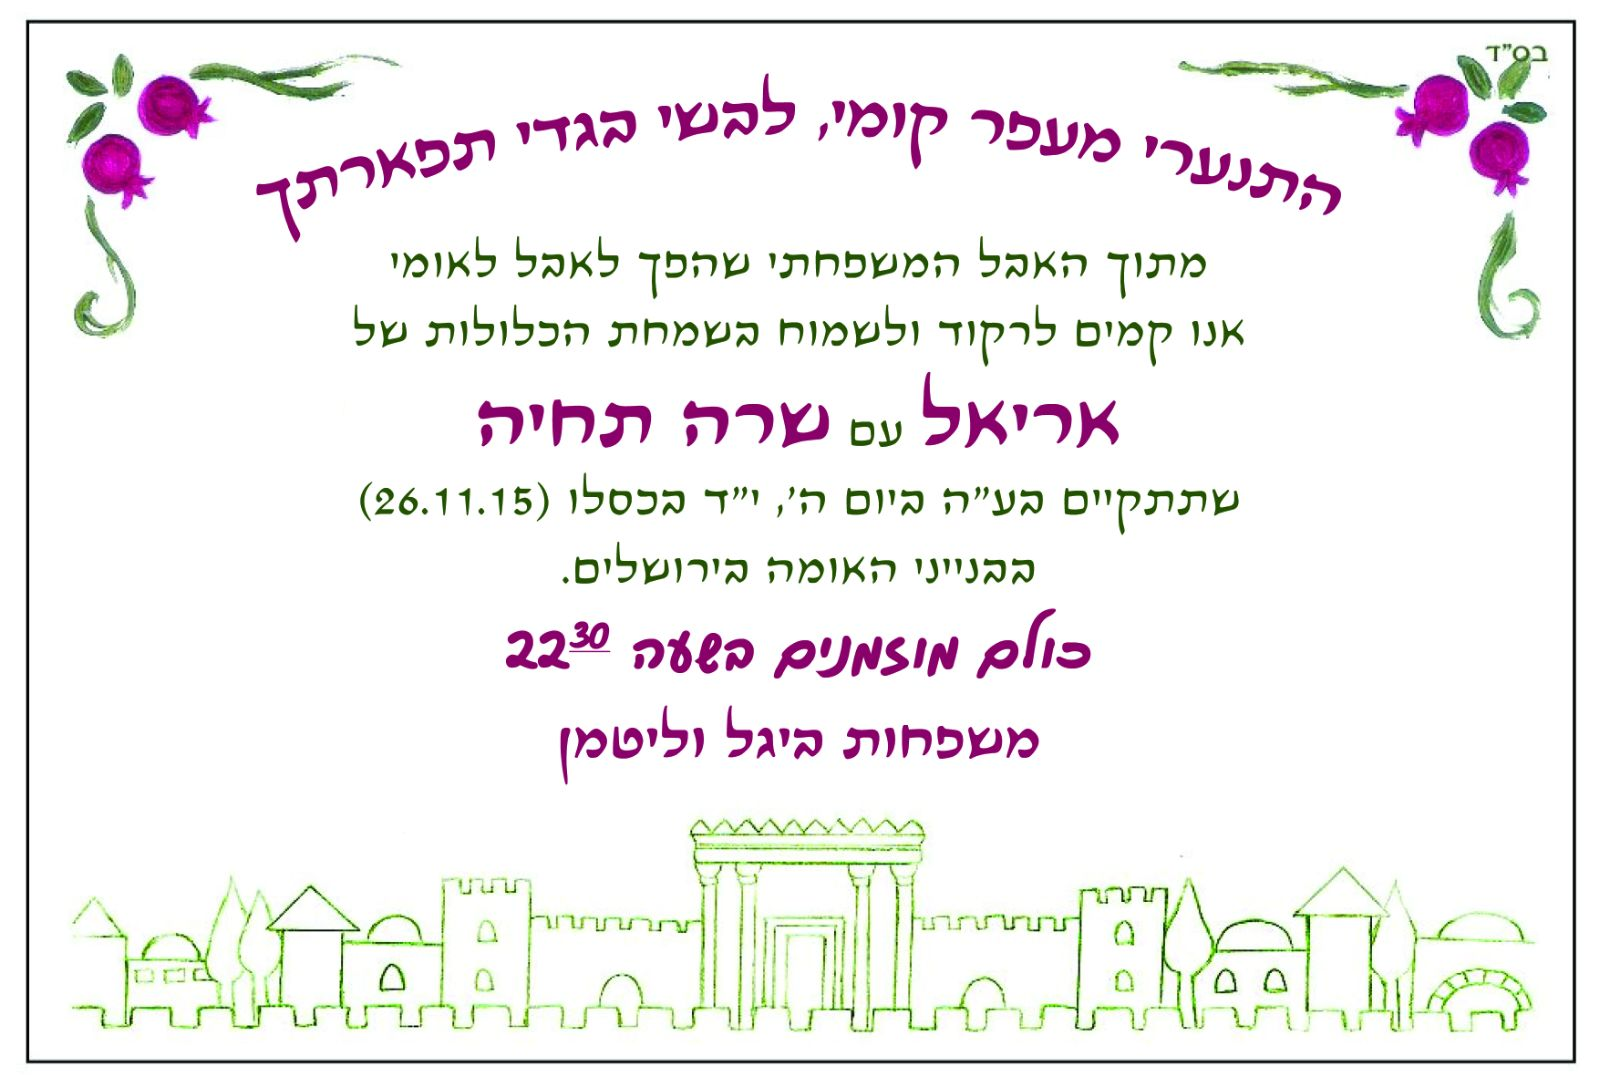 WATCH LIVE NOW! Litman - Beigal Wedding